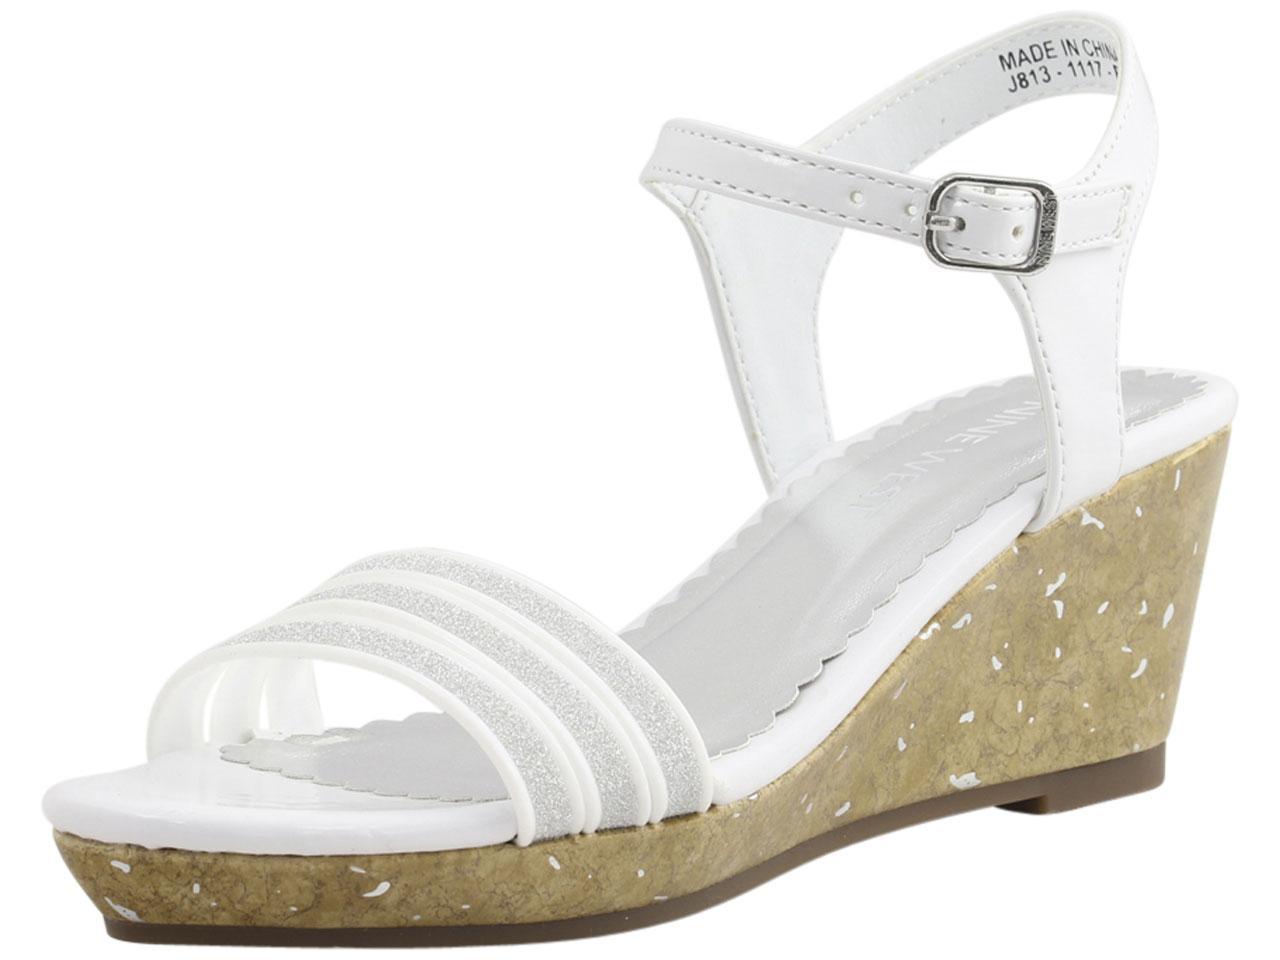 4380c6b3aa8 Nine West Little/Big Girl's Emily-2 Wedge Heel Sandals Shoes